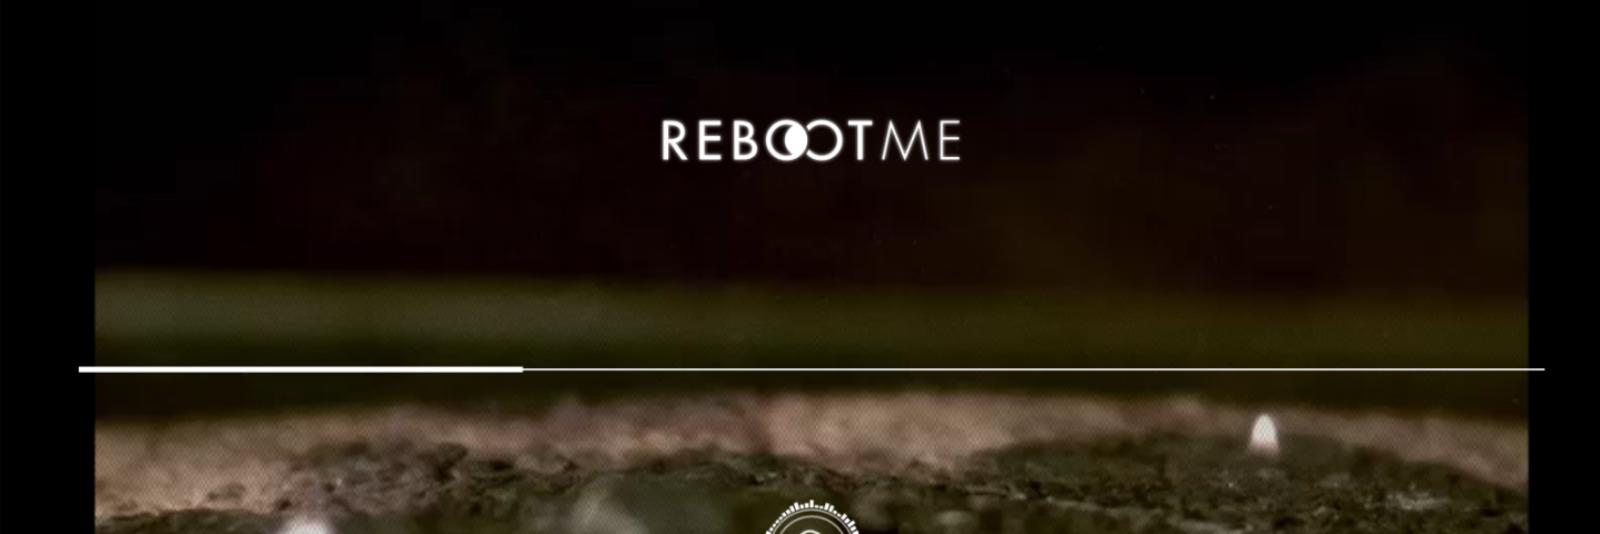 Reboot me